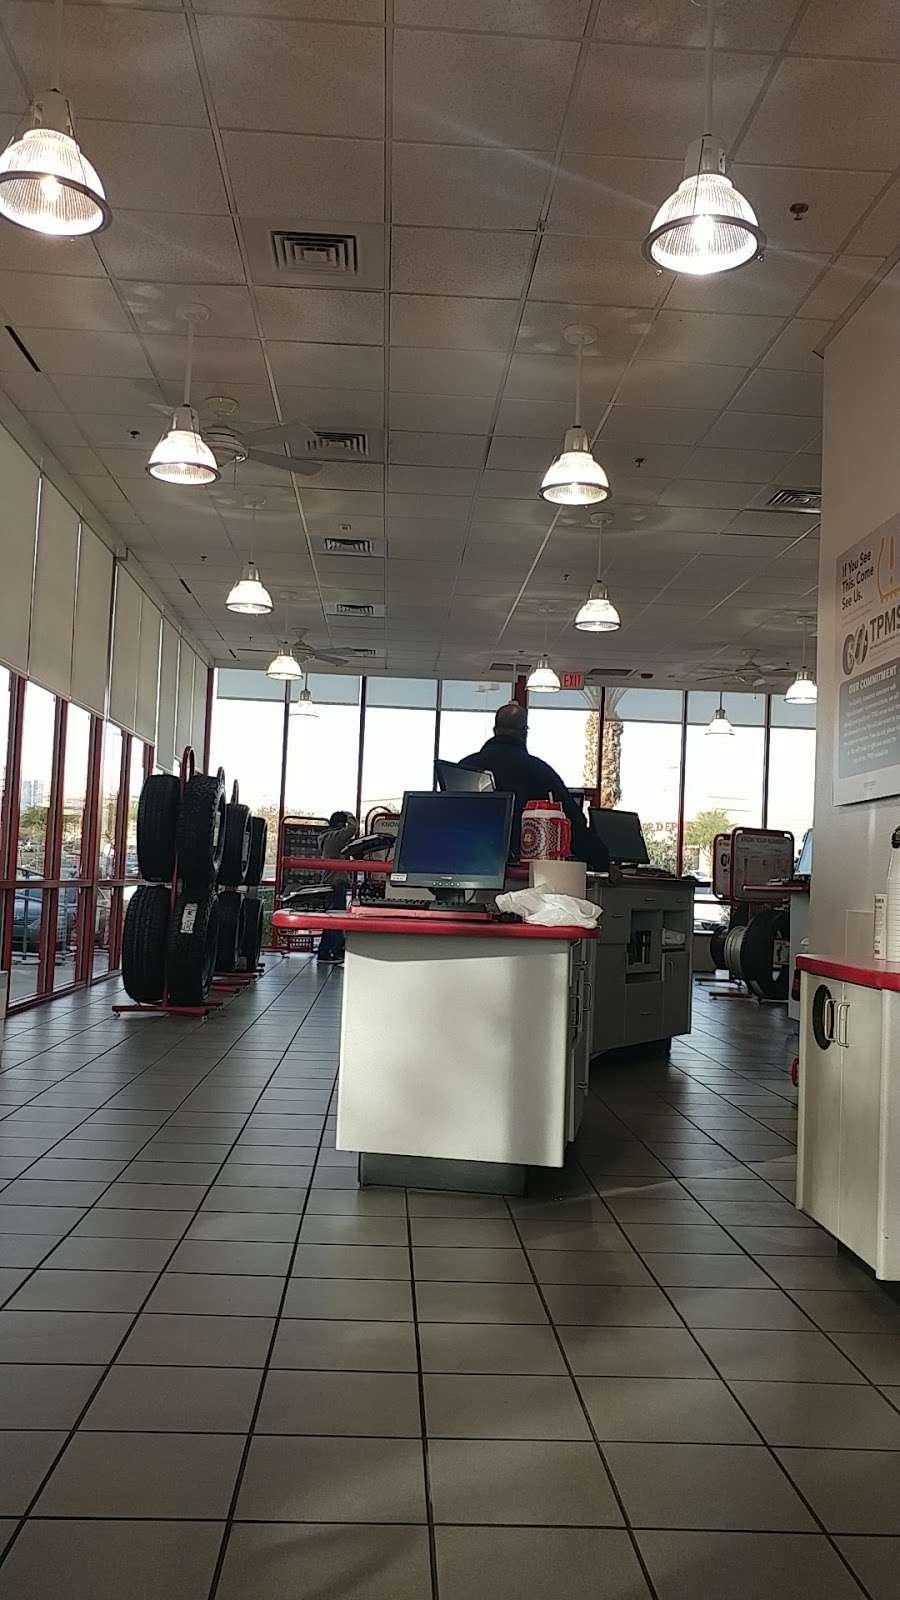 Discount Tire - car repair  | Photo 10 of 10 | Address: 3830 Blue Diamond Rd, Las Vegas, NV 89139, USA | Phone: (702) 893-3322